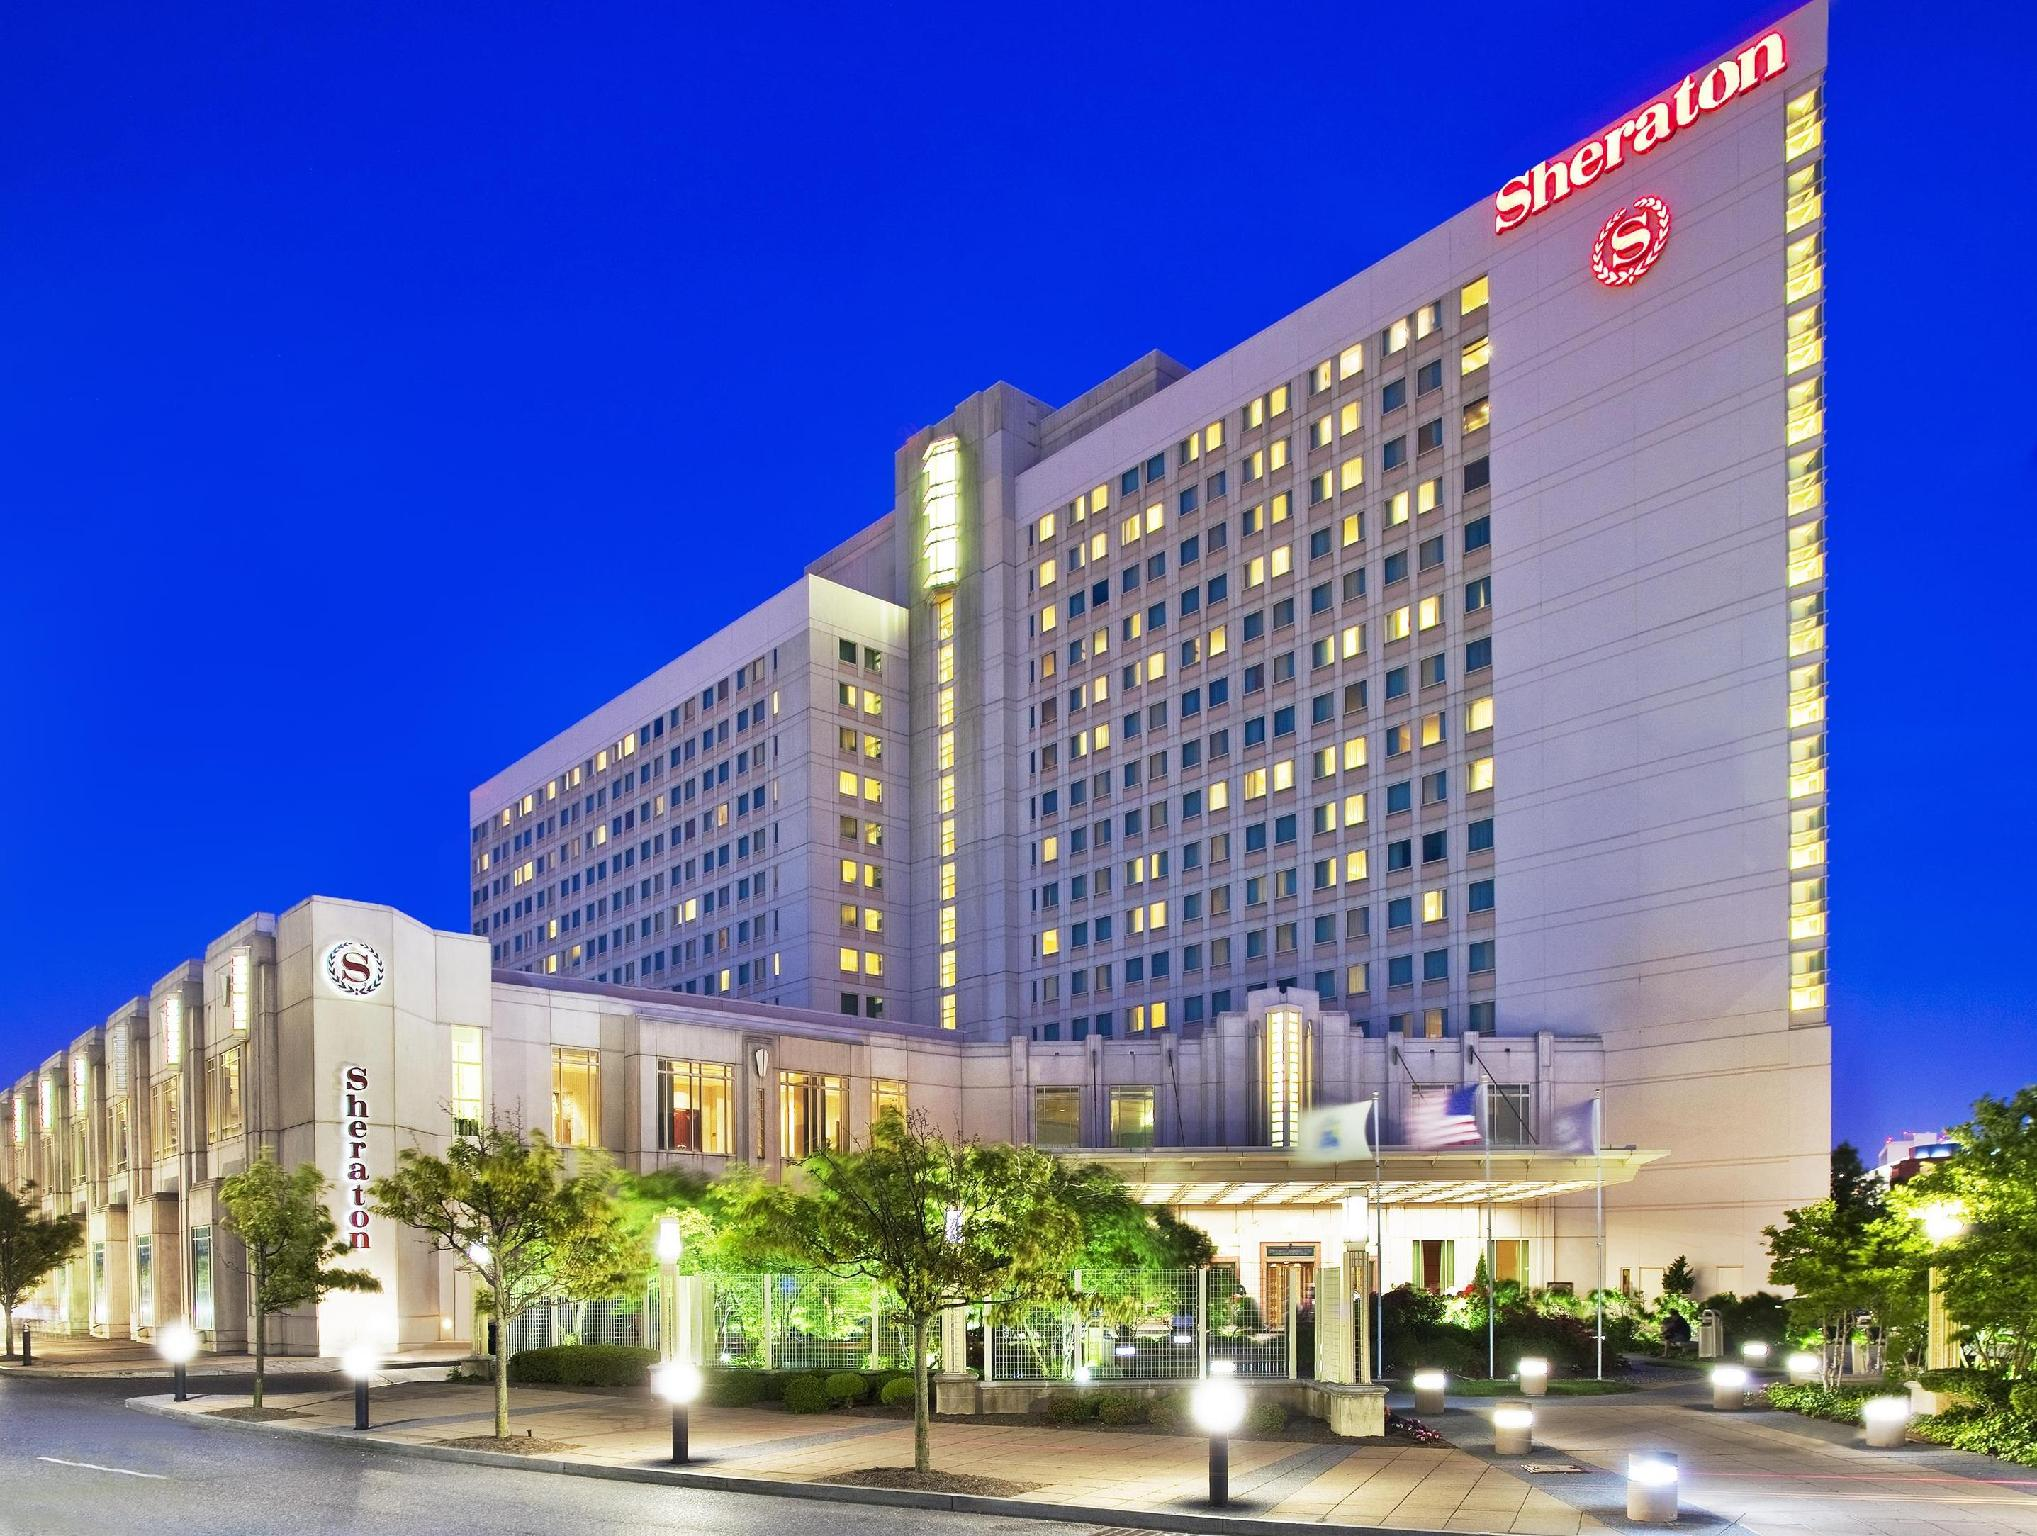 Hotels Near Atlantic City Convention Center